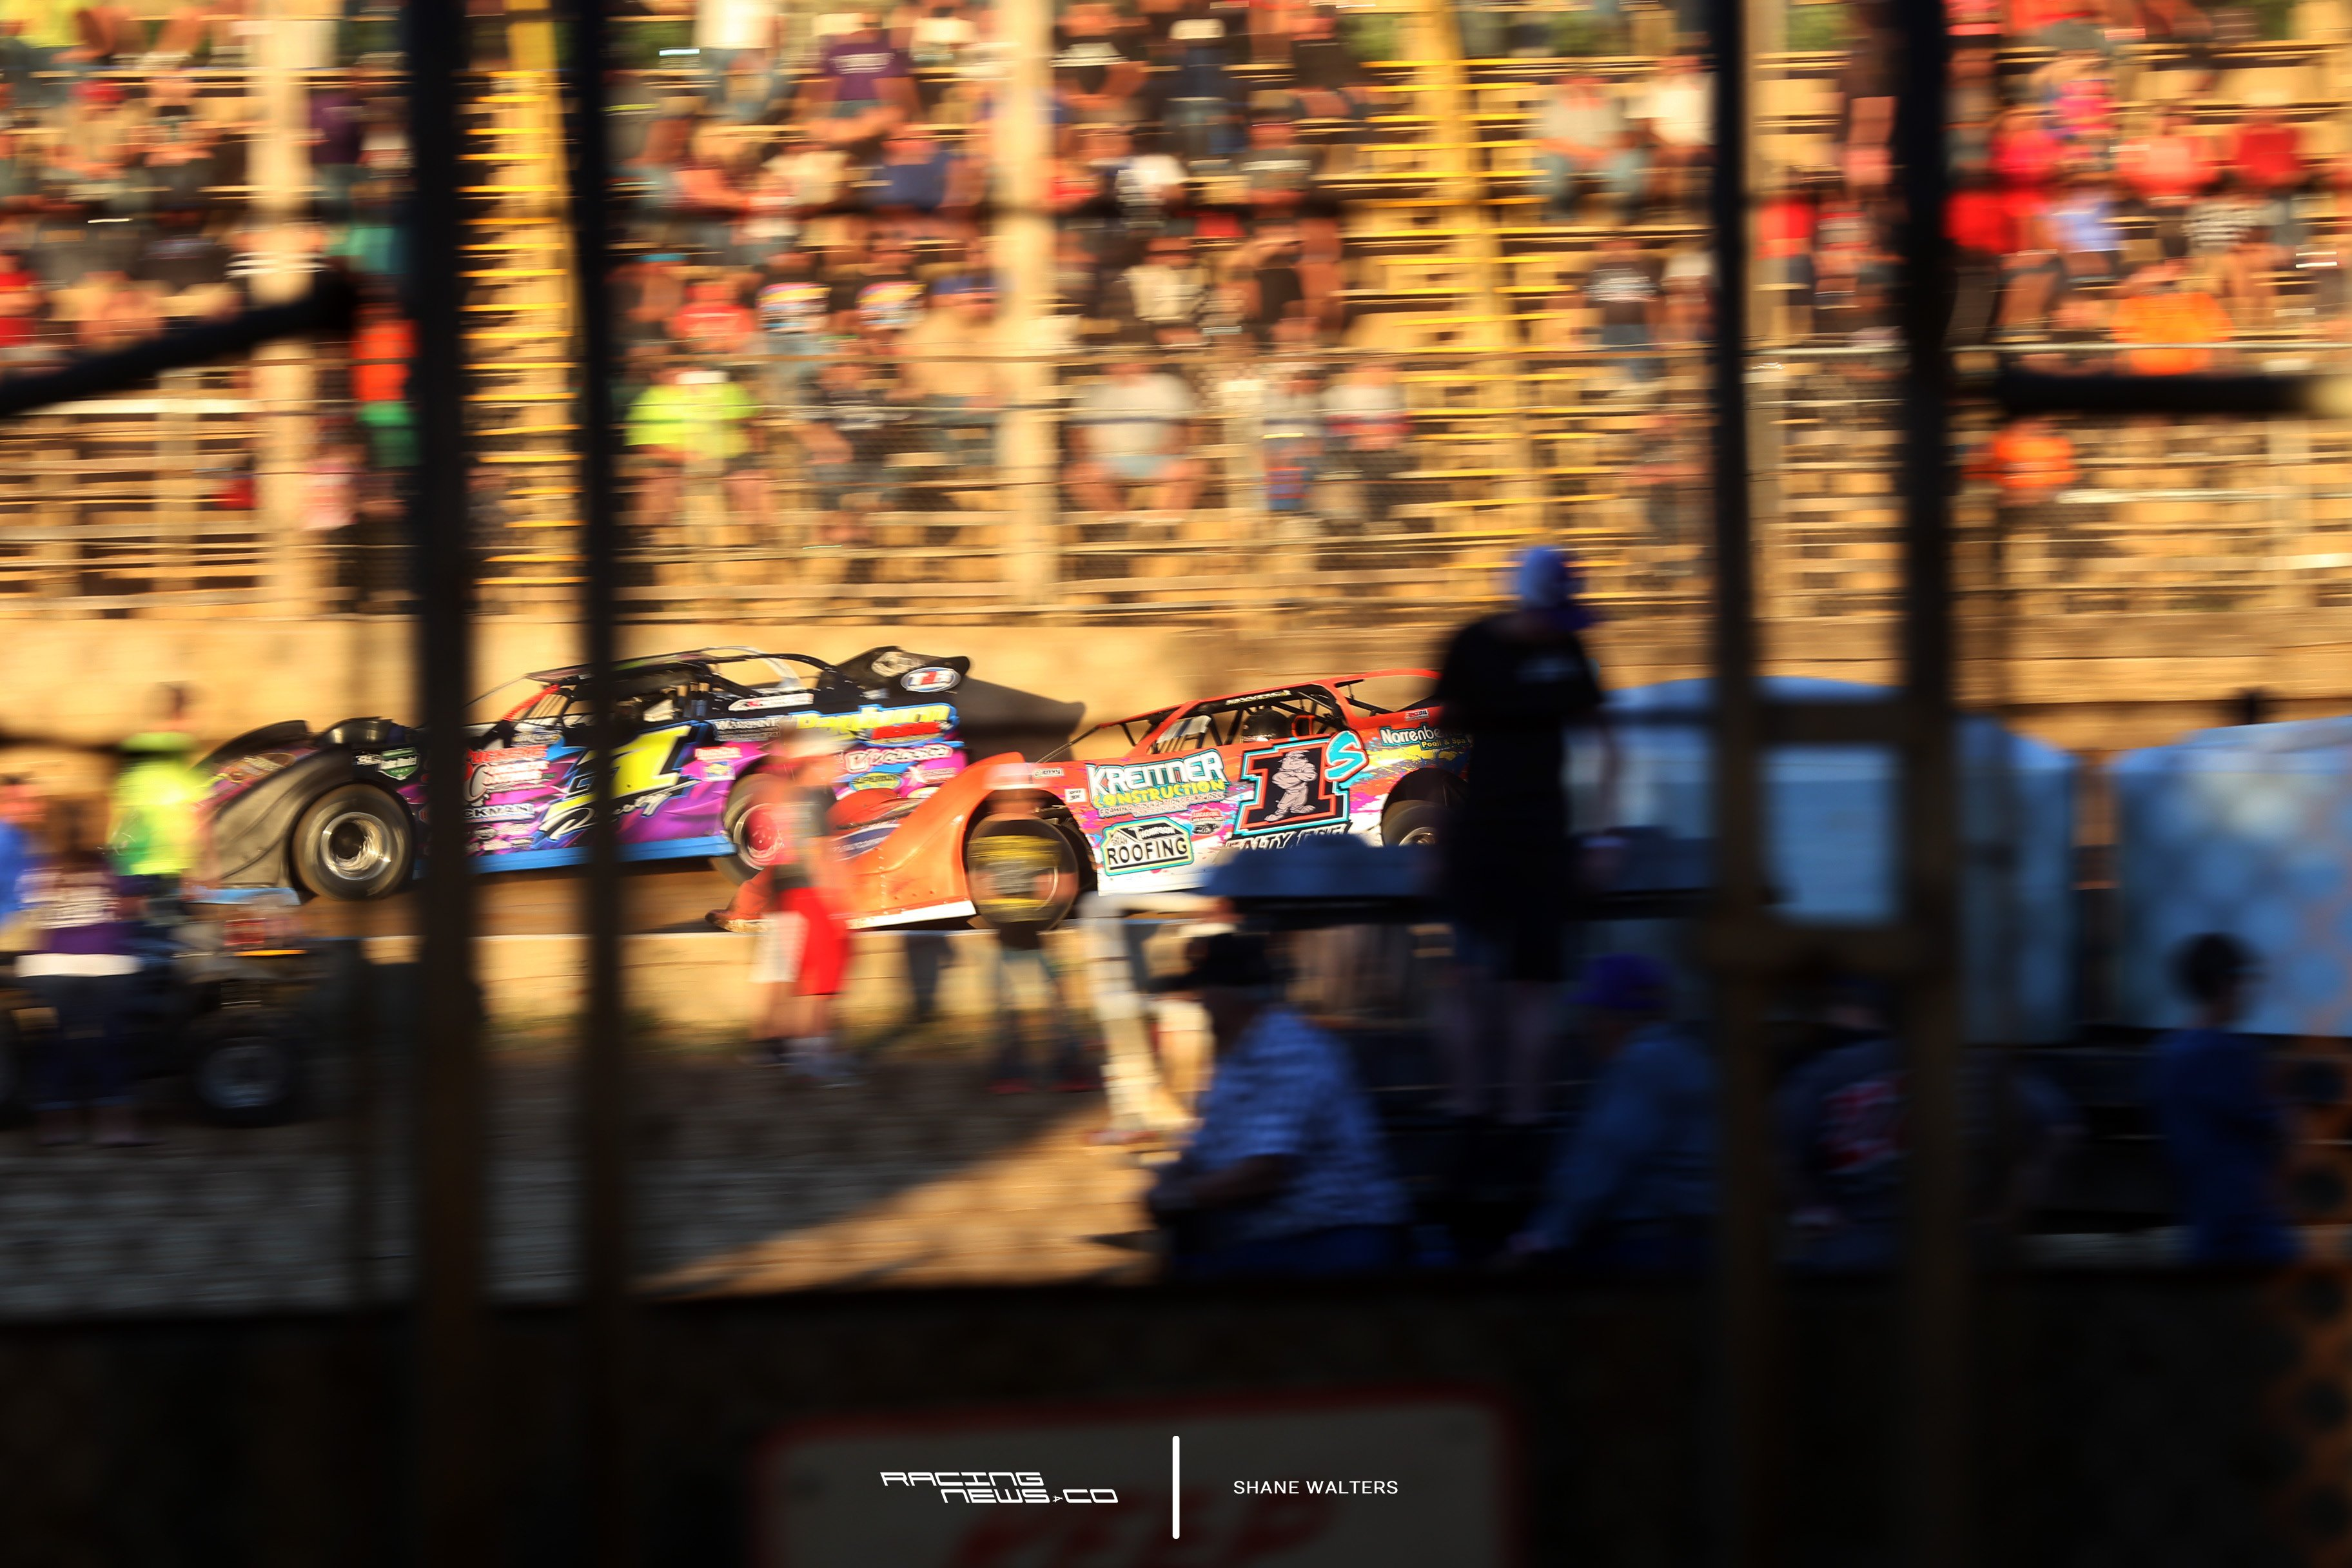 Rick Salter Rusty Schlenk Belle-Clair Speedway Photos 2558